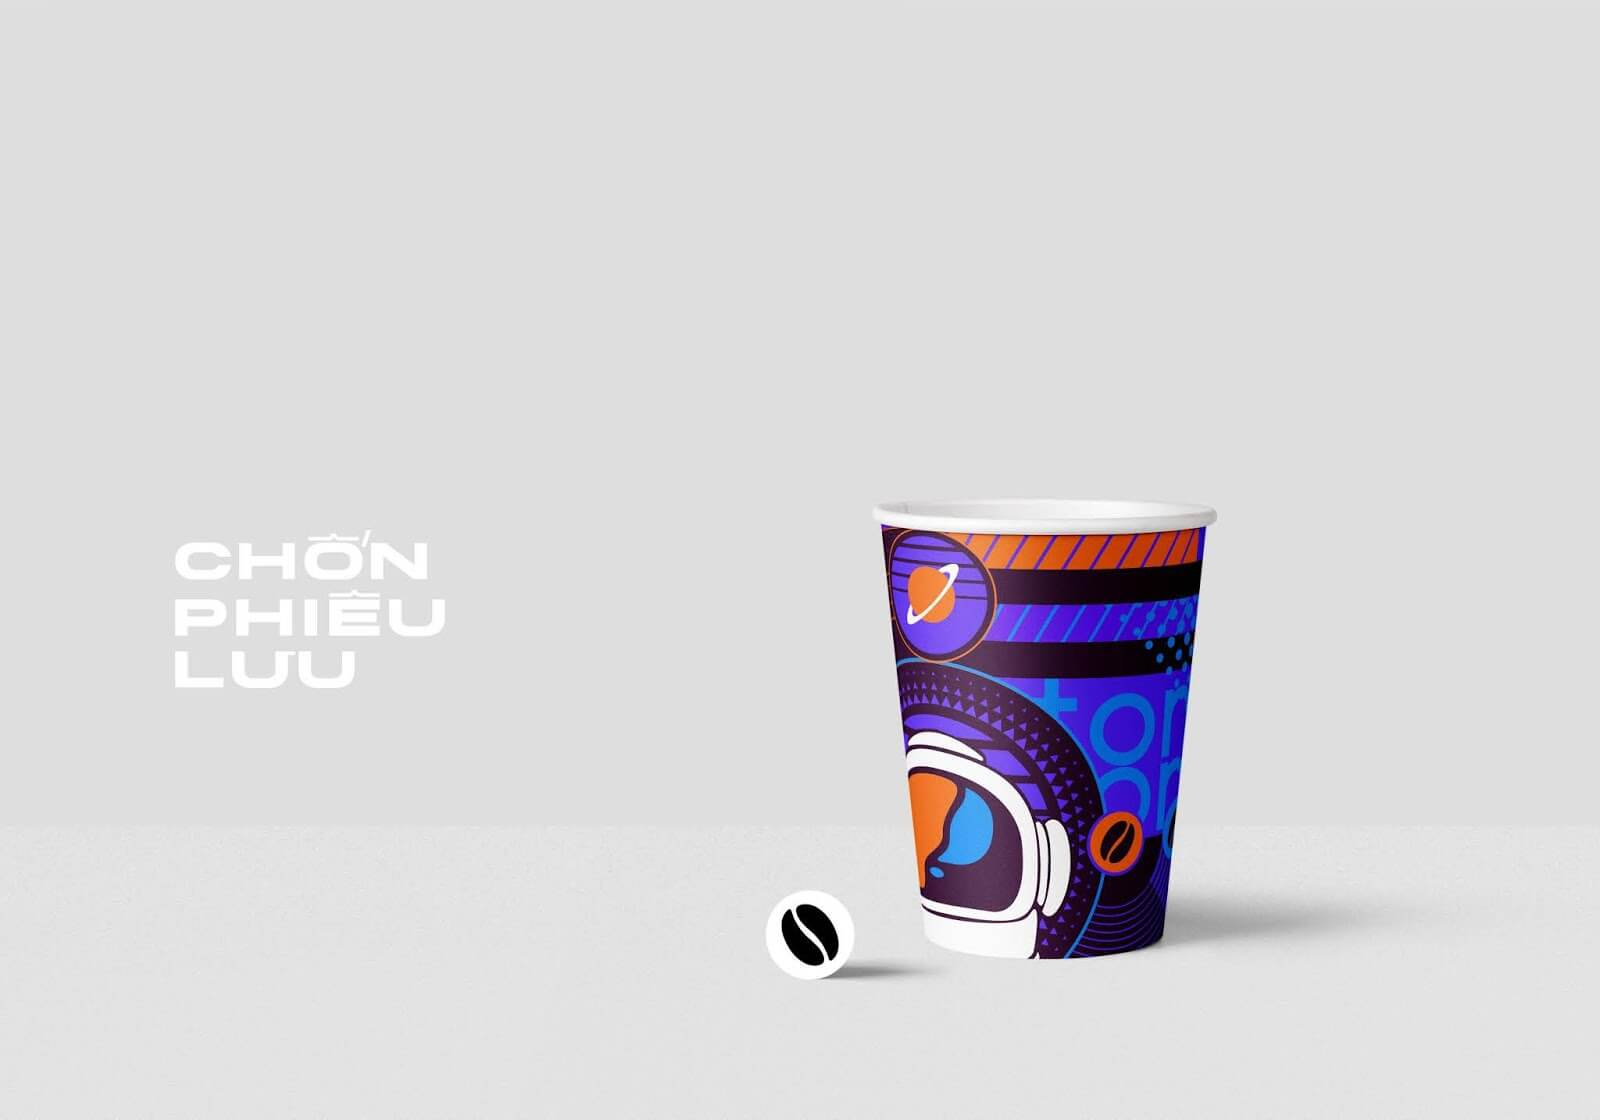 17 submit project tonbui - Ach, tie obaly - Cà phê Việt Nam Vietnam Coffee